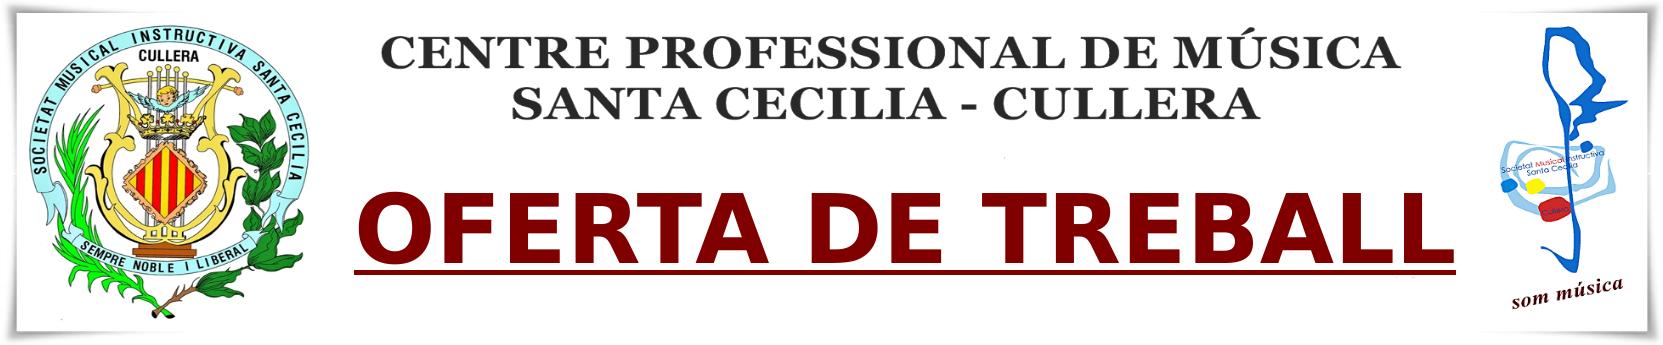 centro profesional